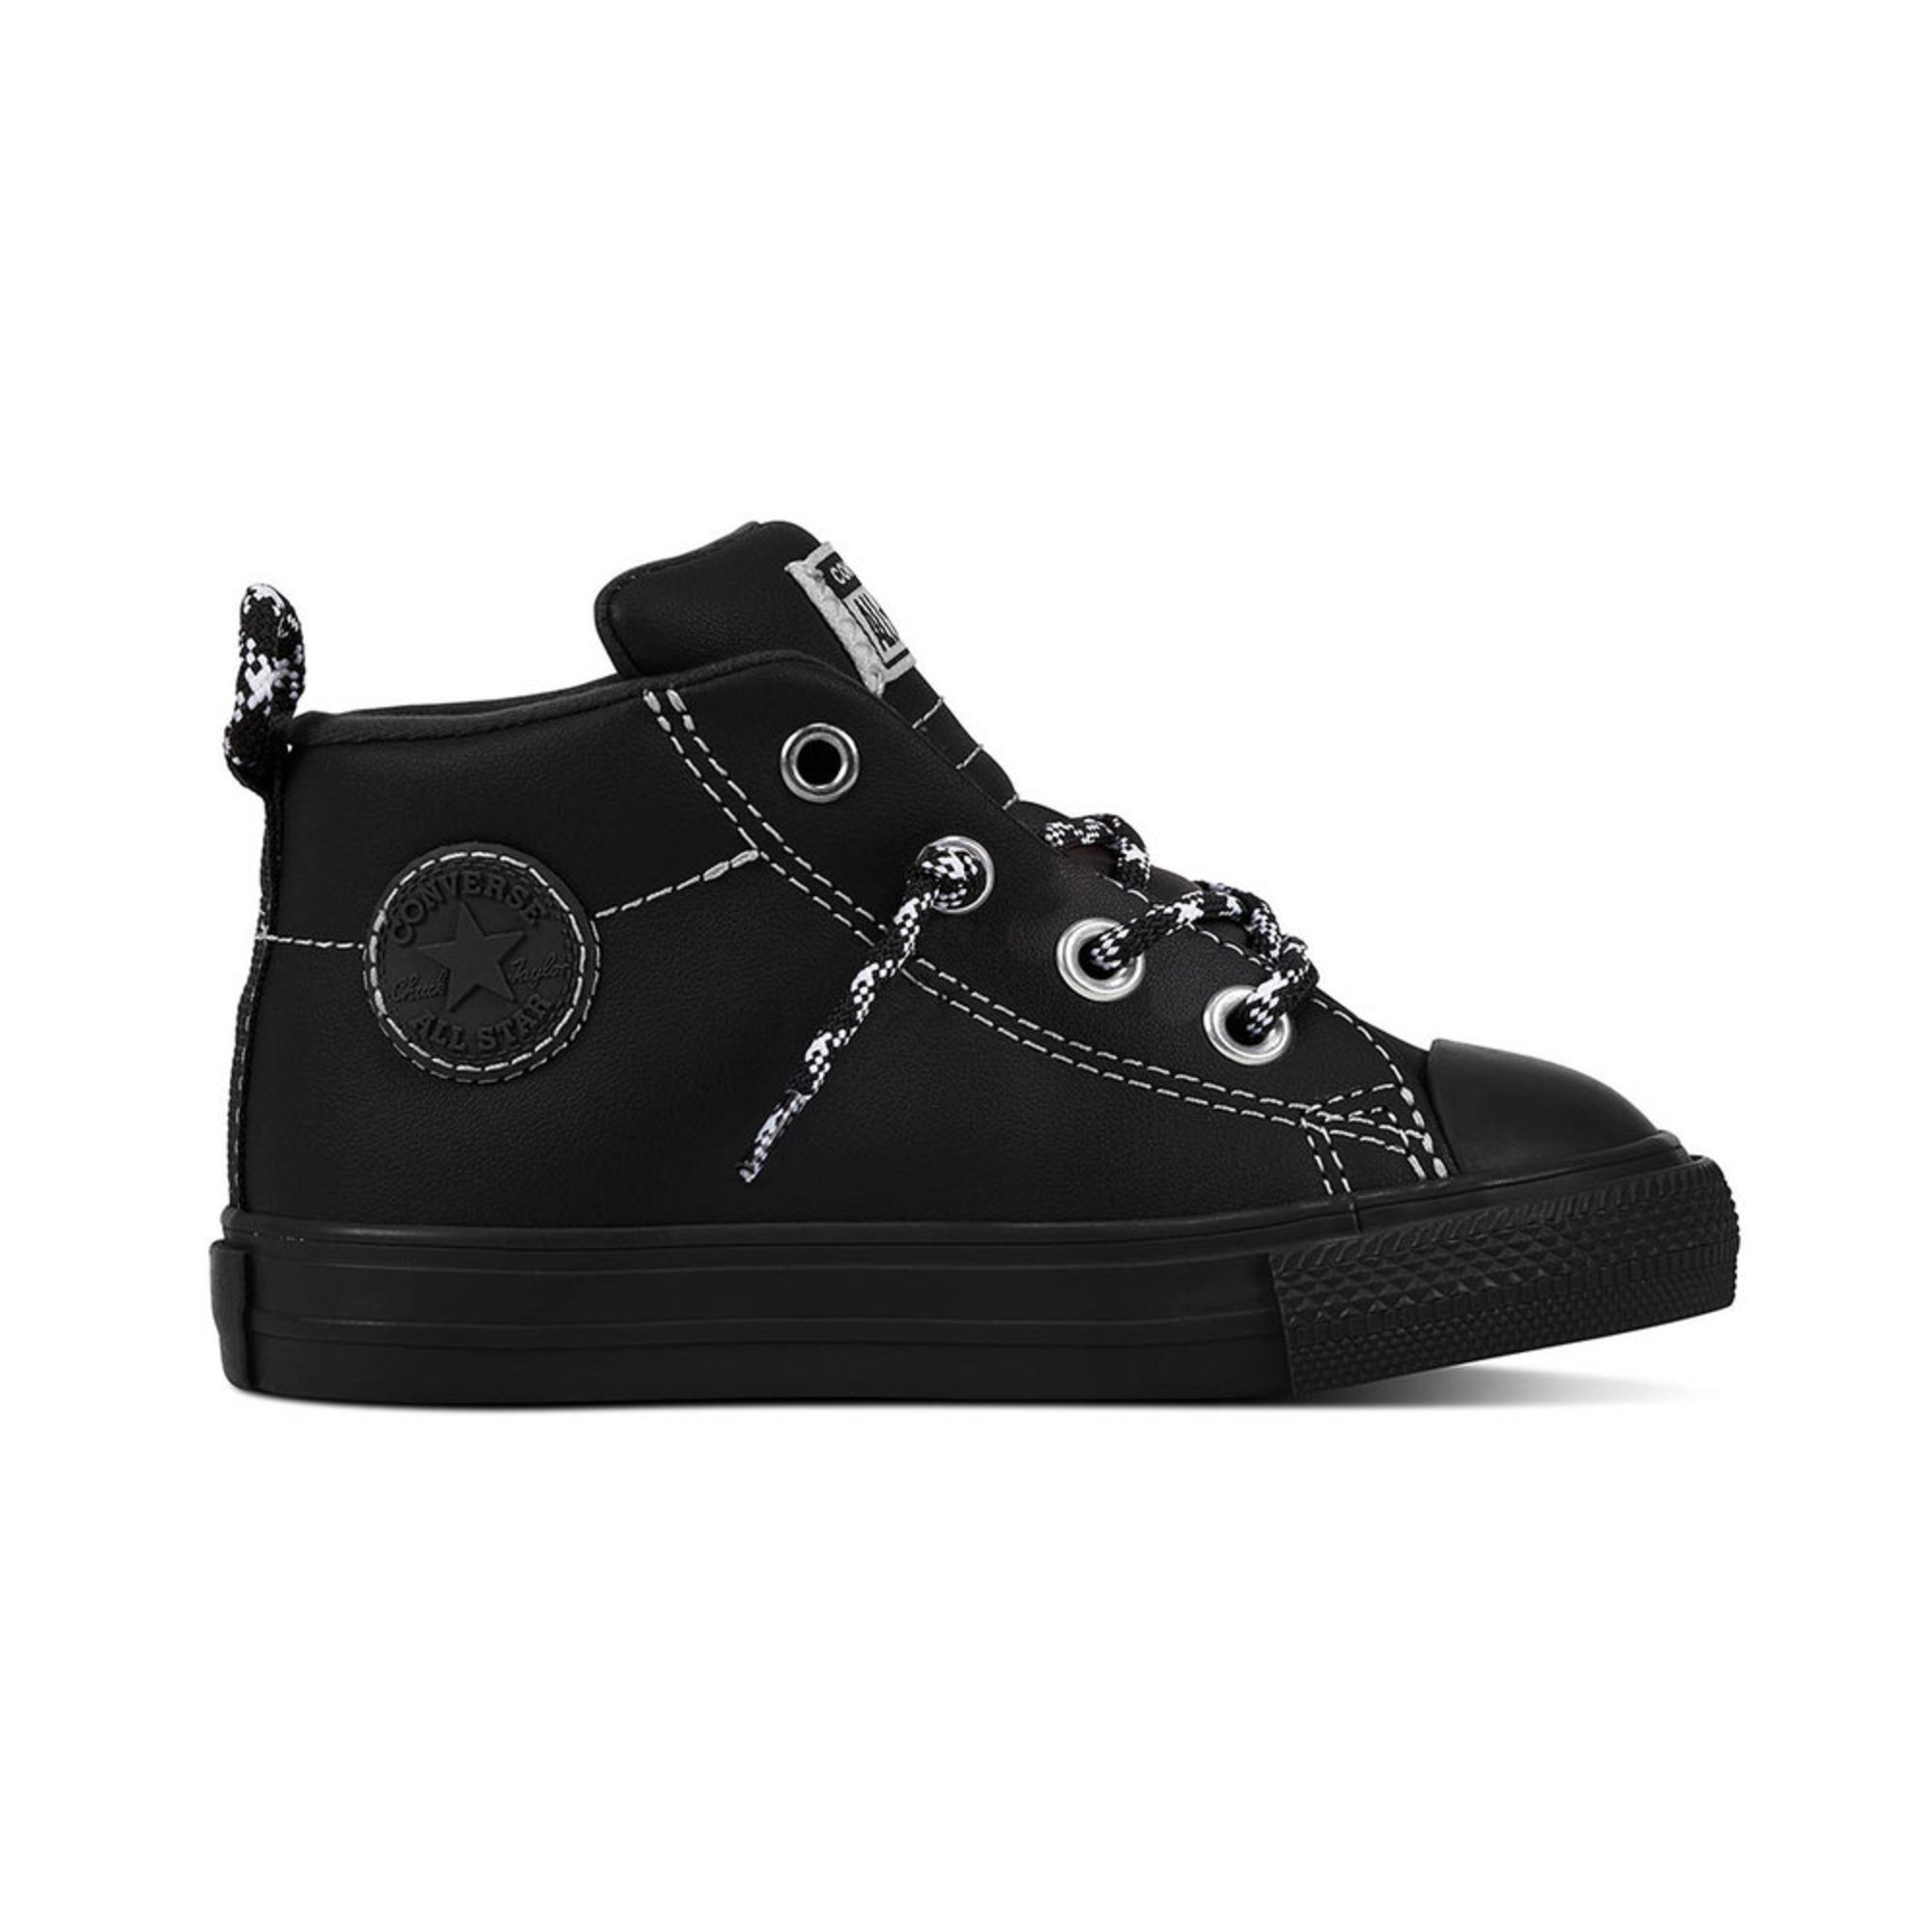 3162d842d468a6 Converse. Converse Boys Chuck Taylor All Star Street Hiker Mid Sneaker ( Infant Toddler)